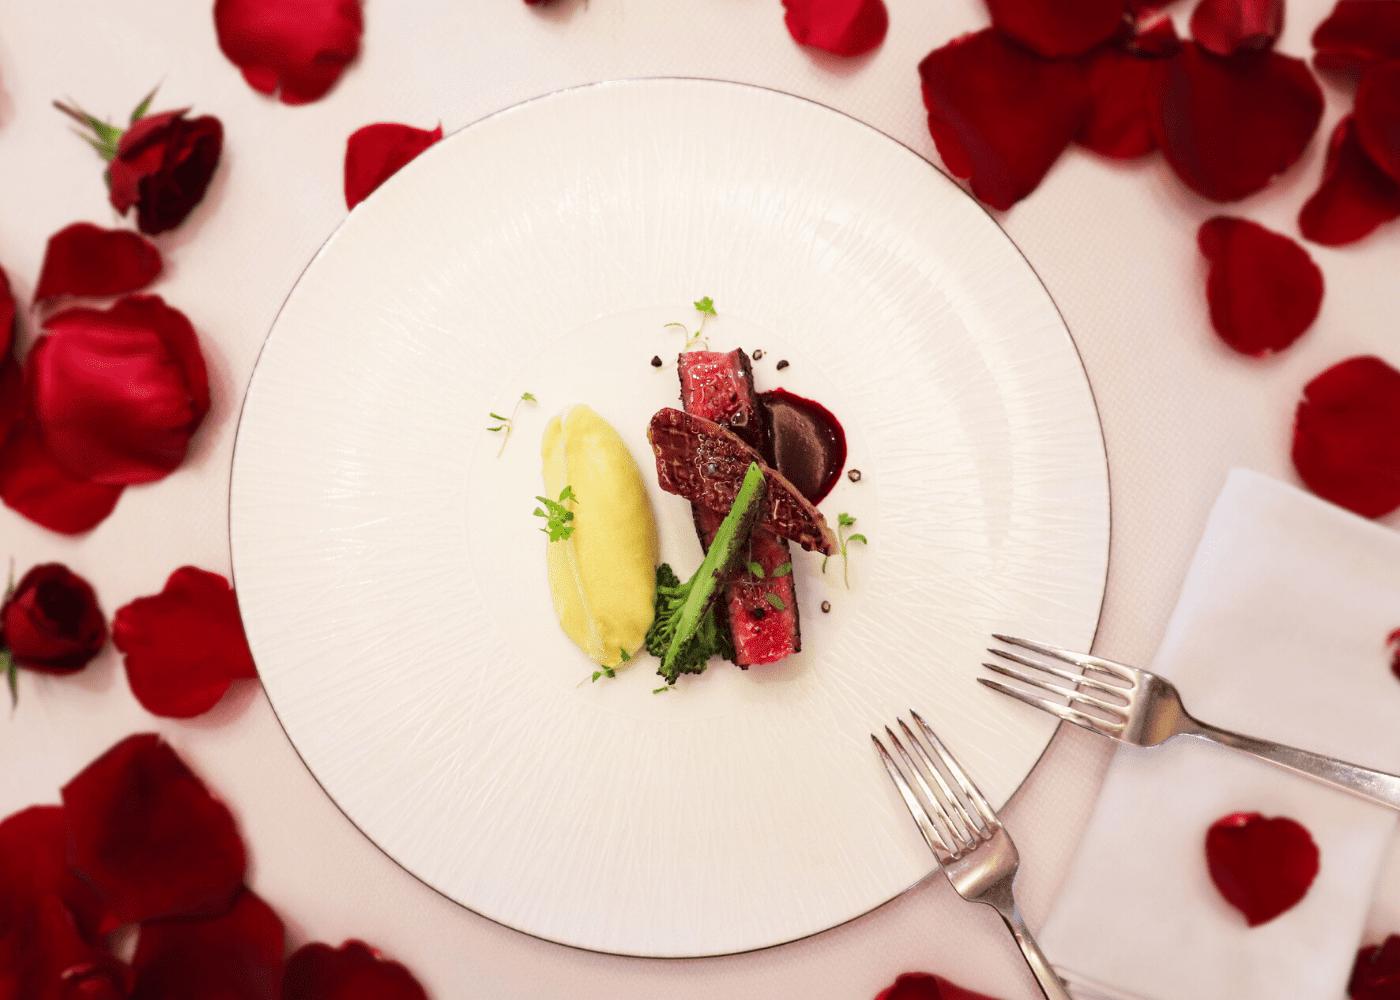 the knolls capella romantic restaurants dinner valentines day 2020